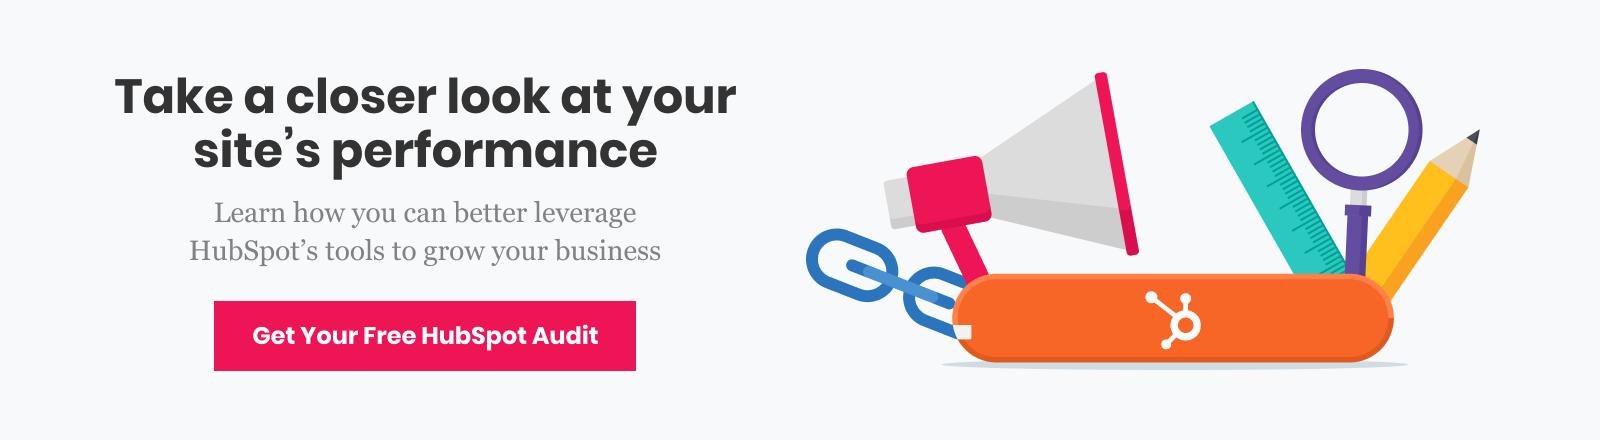 Get Your Free HubSpot Audit